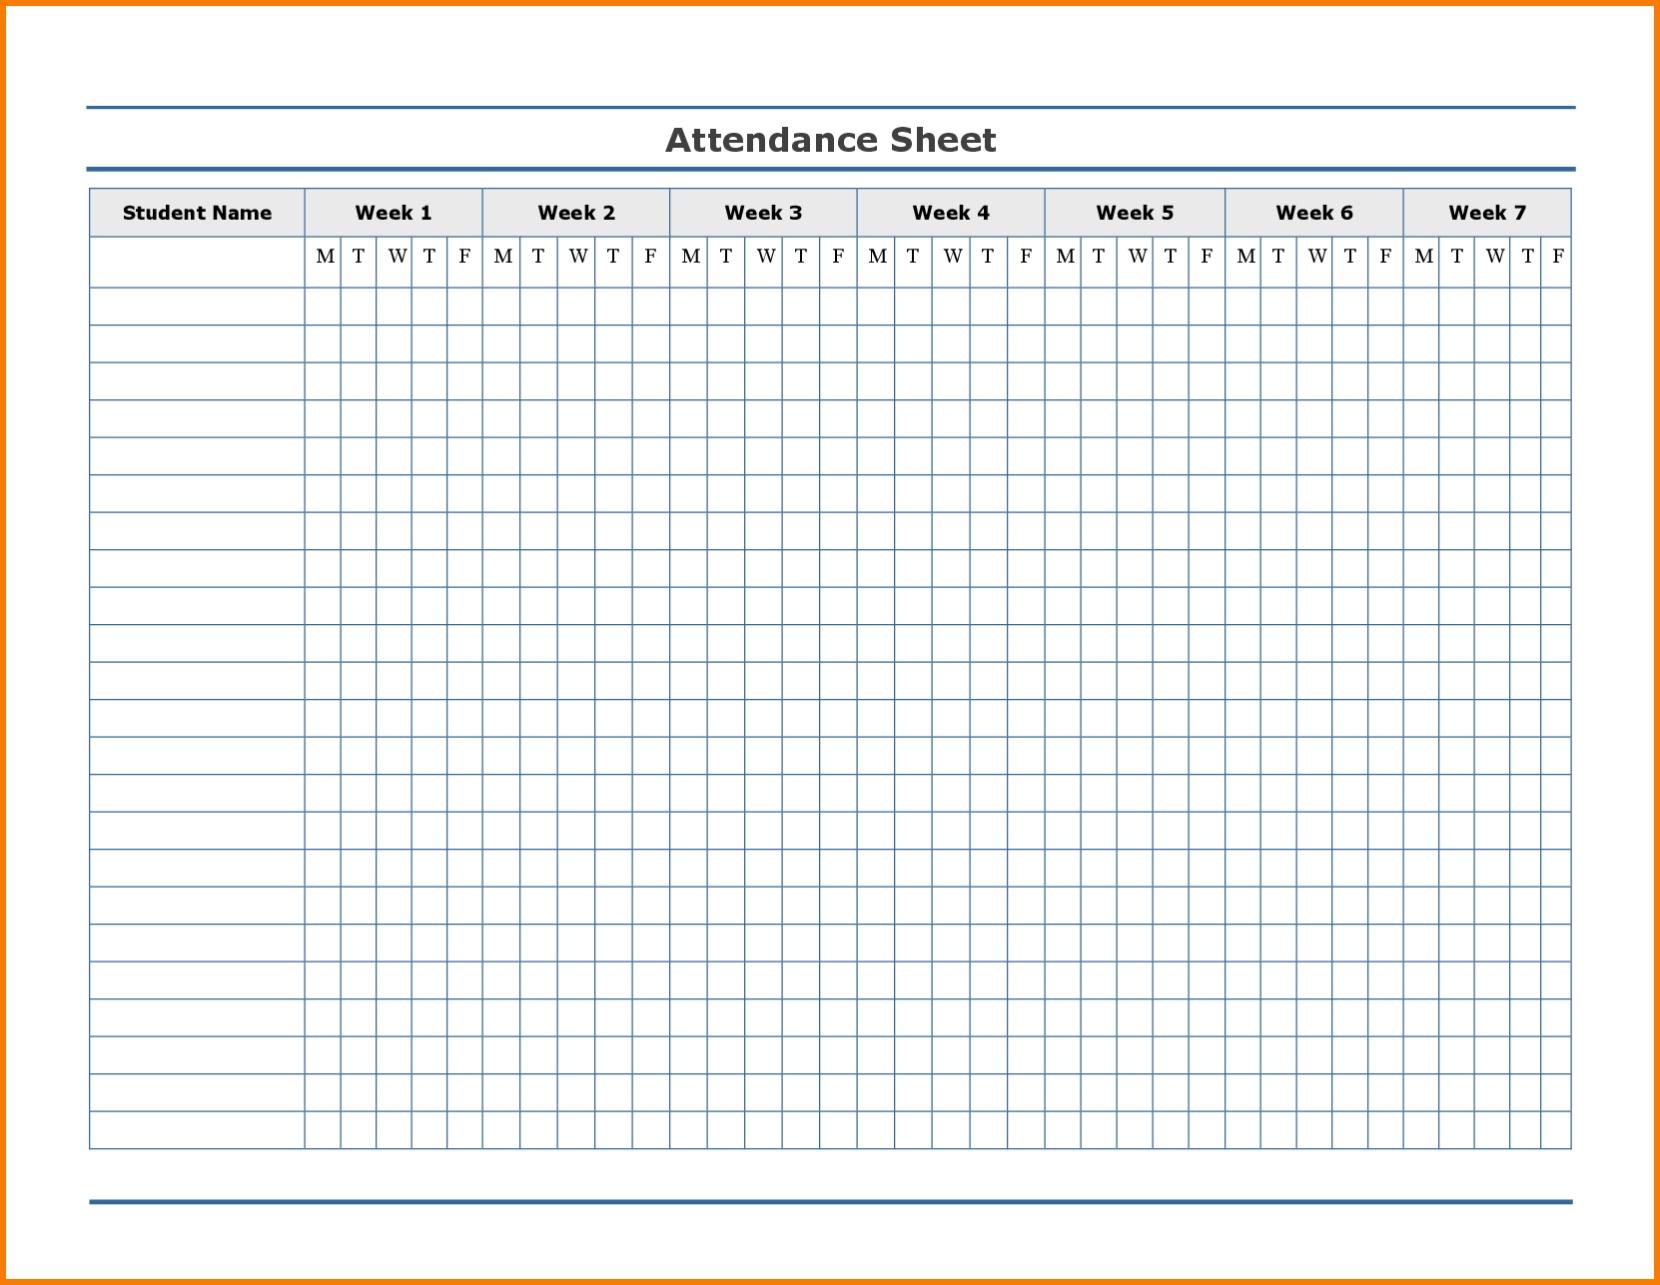 Employee Attendance Excel Sheet | Employee Attendance Sheet  Free Printable 2020 Employee Attendance Sheet